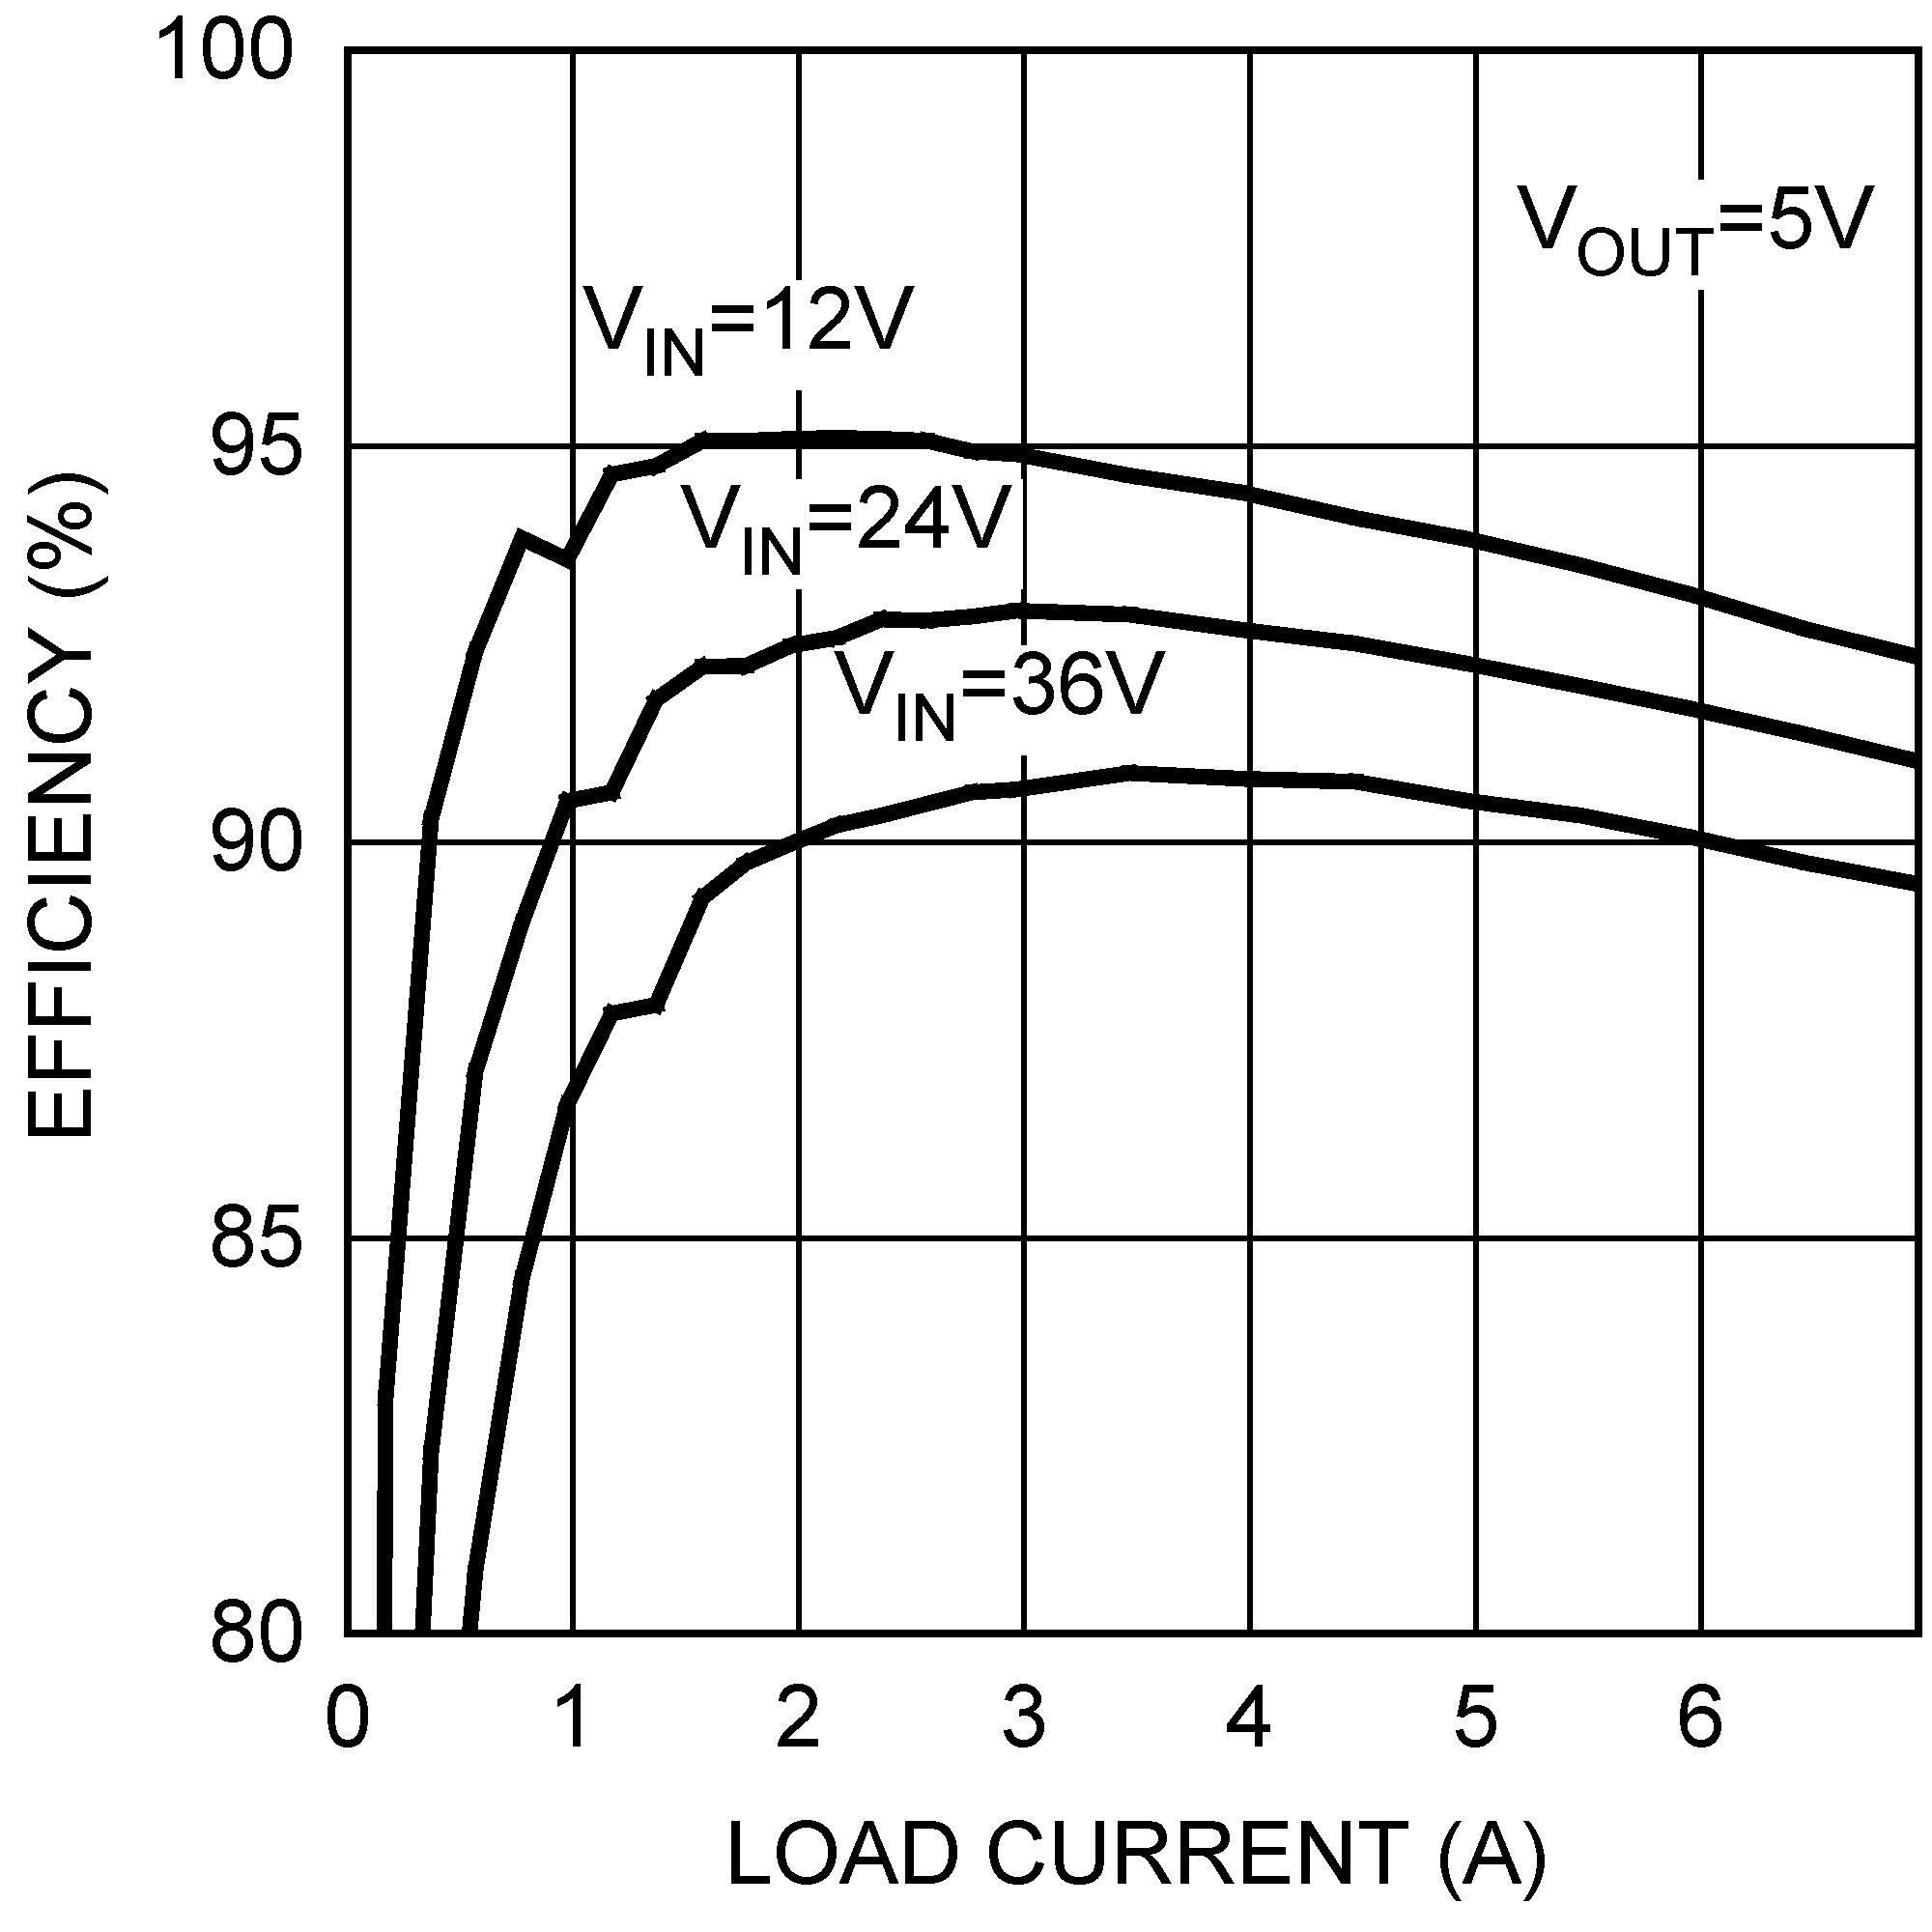 Lm25116 Potentialdividercircuitequationgif 823 Application Curves